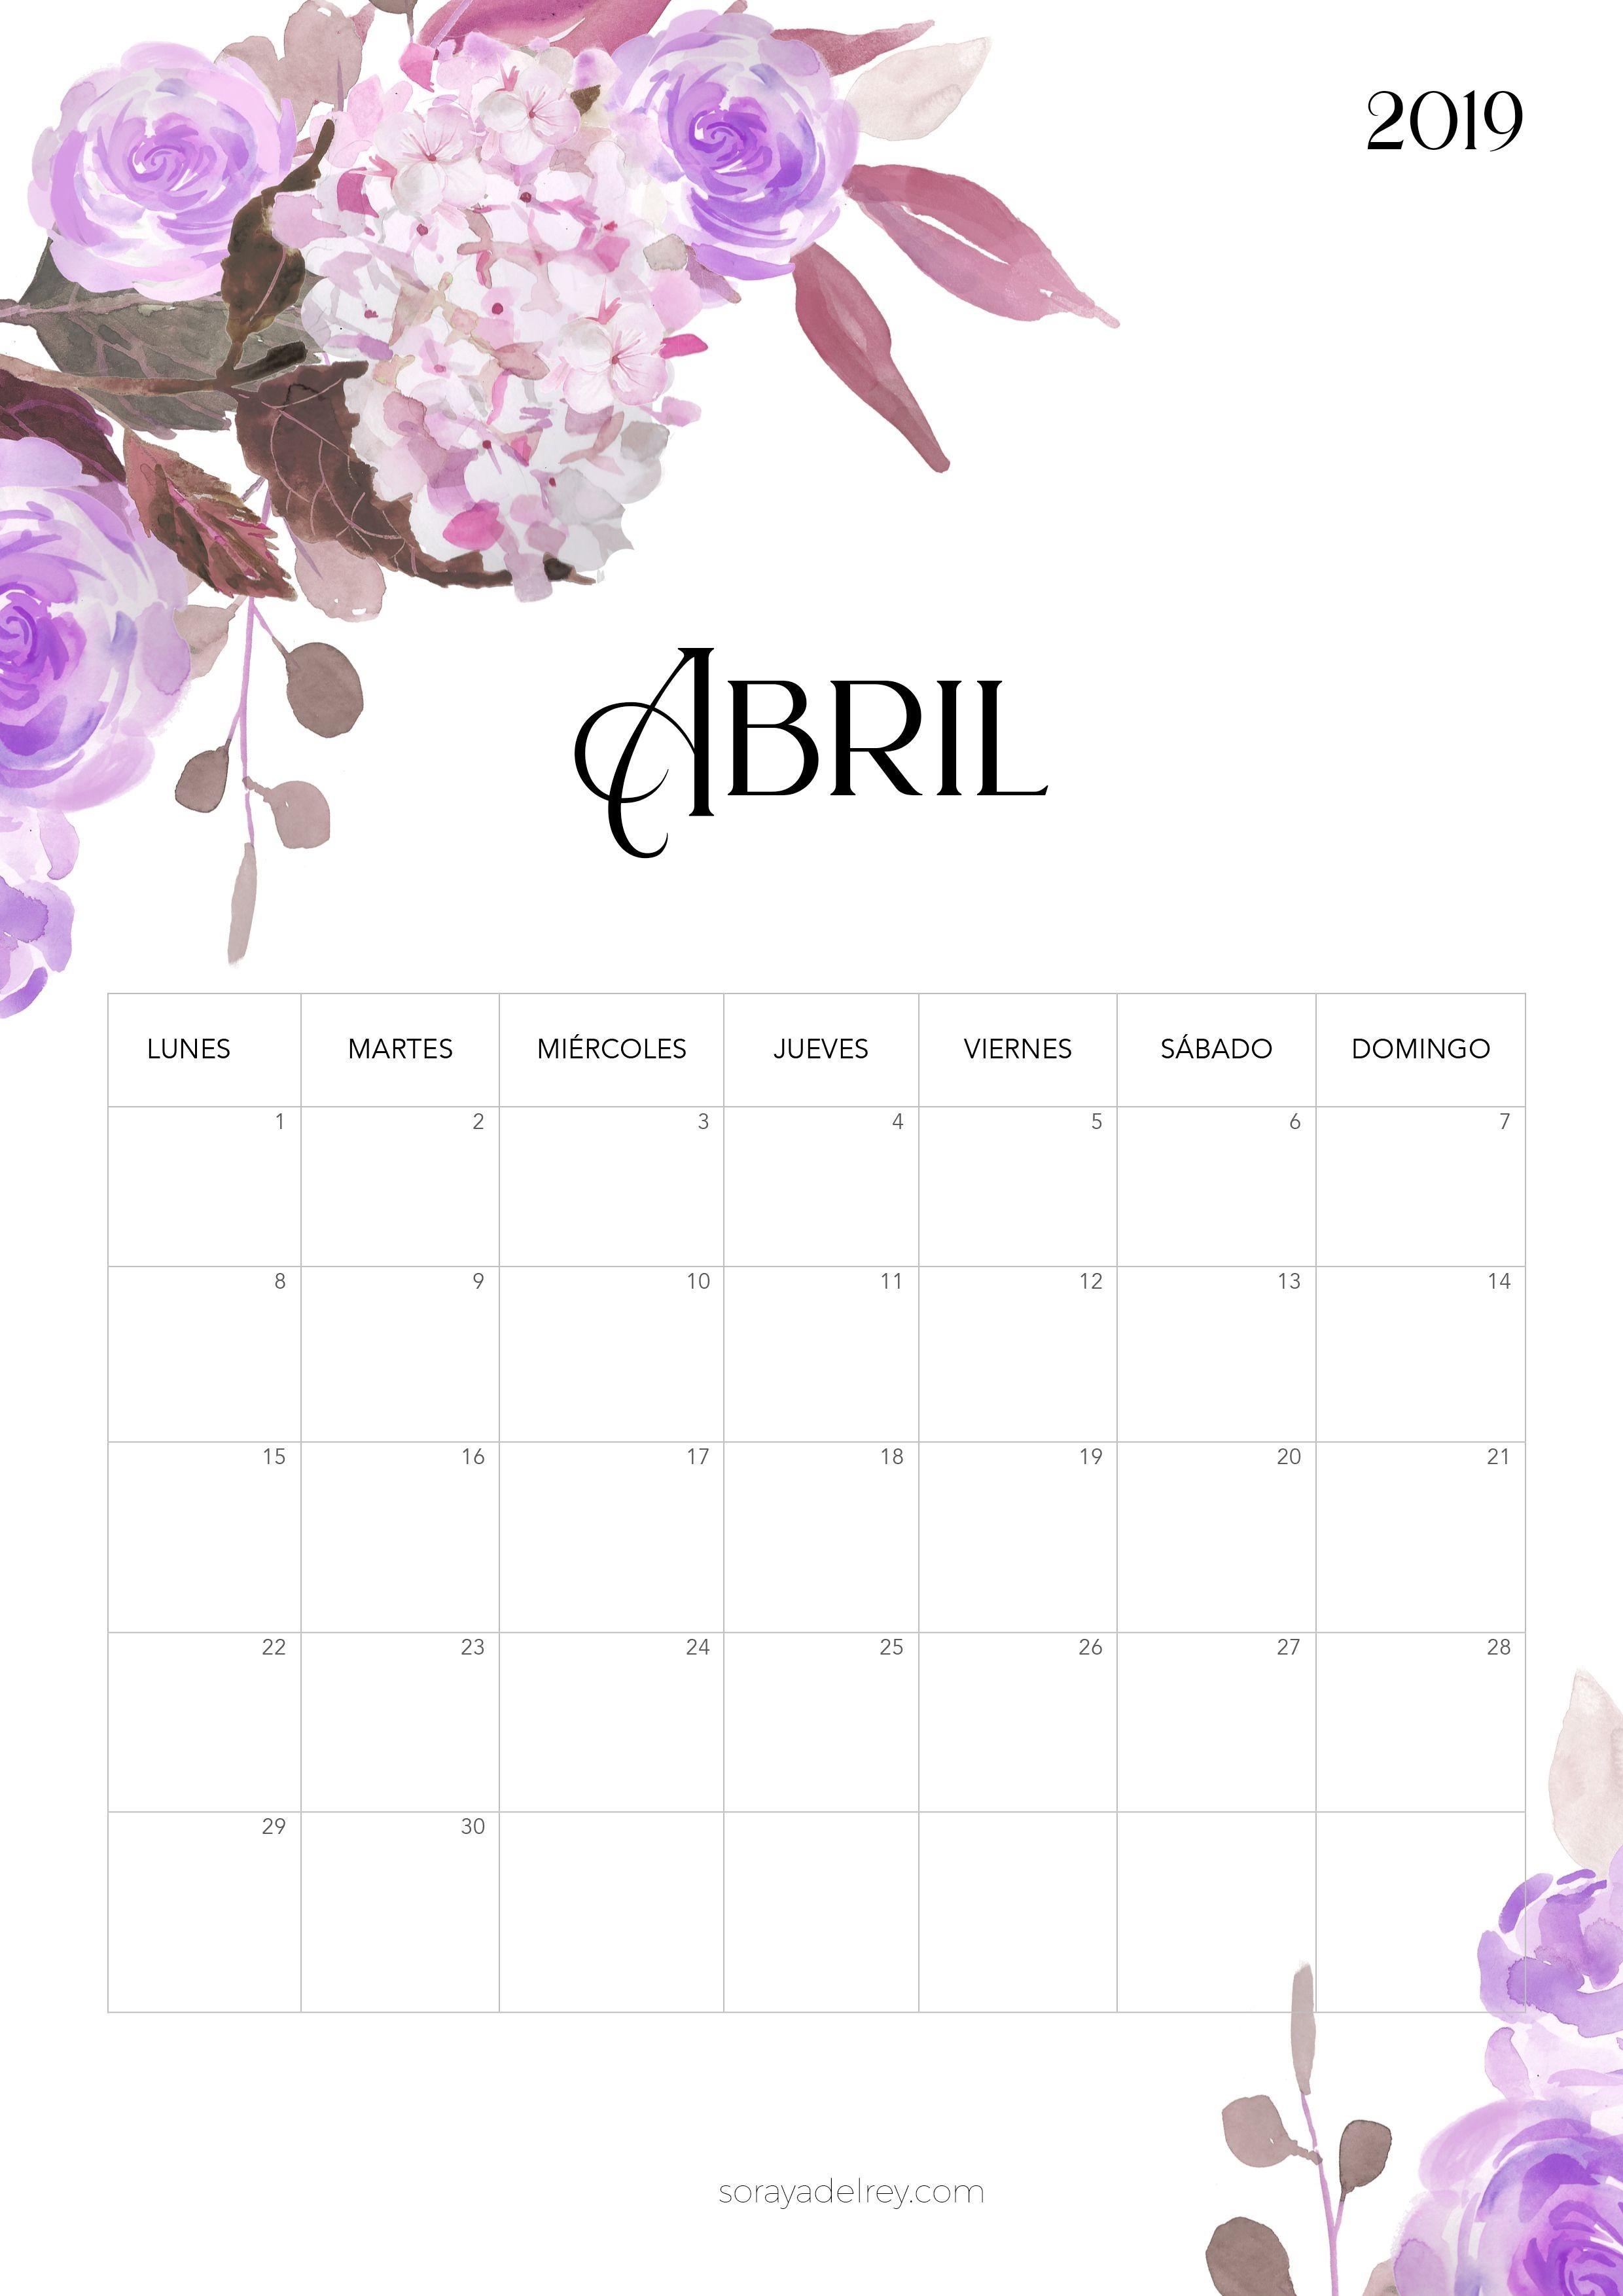 Calendario Abril 2019 Para Imprimir Por Mes Mejores Y Más Novedosos Informes Calendario Para Imprimir Septiembre Octubre